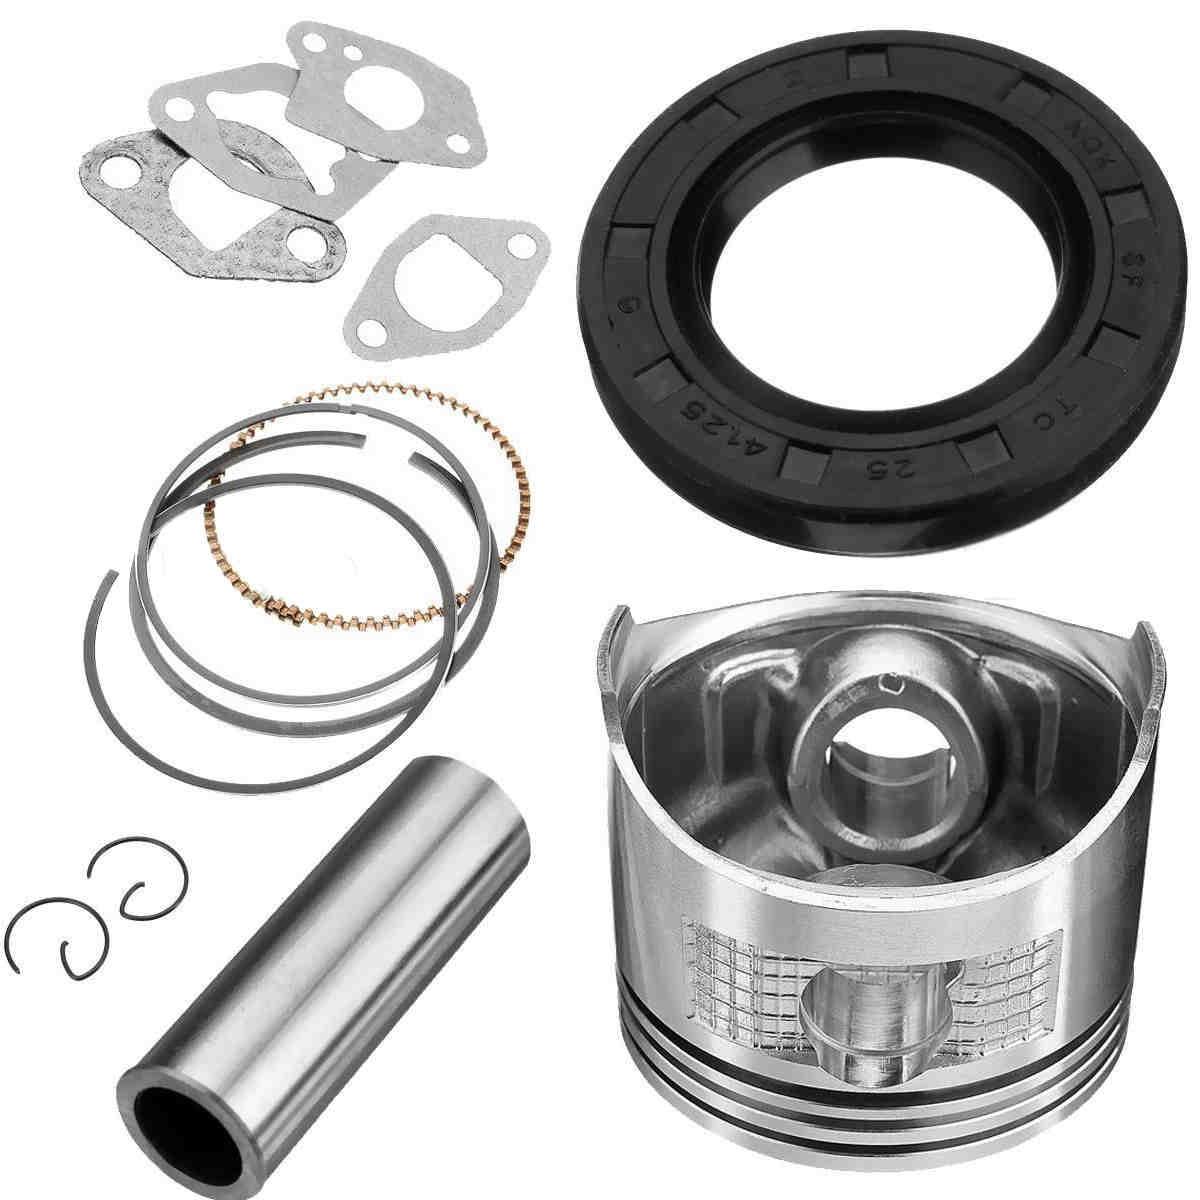 DWZ Rebuild Kit Set w/ Piston Ring + Gasket For GX160 GX200 5.5 6.5HP Engine New jiangdong engine parts the jd495b engine the set of piston group with gasket kit